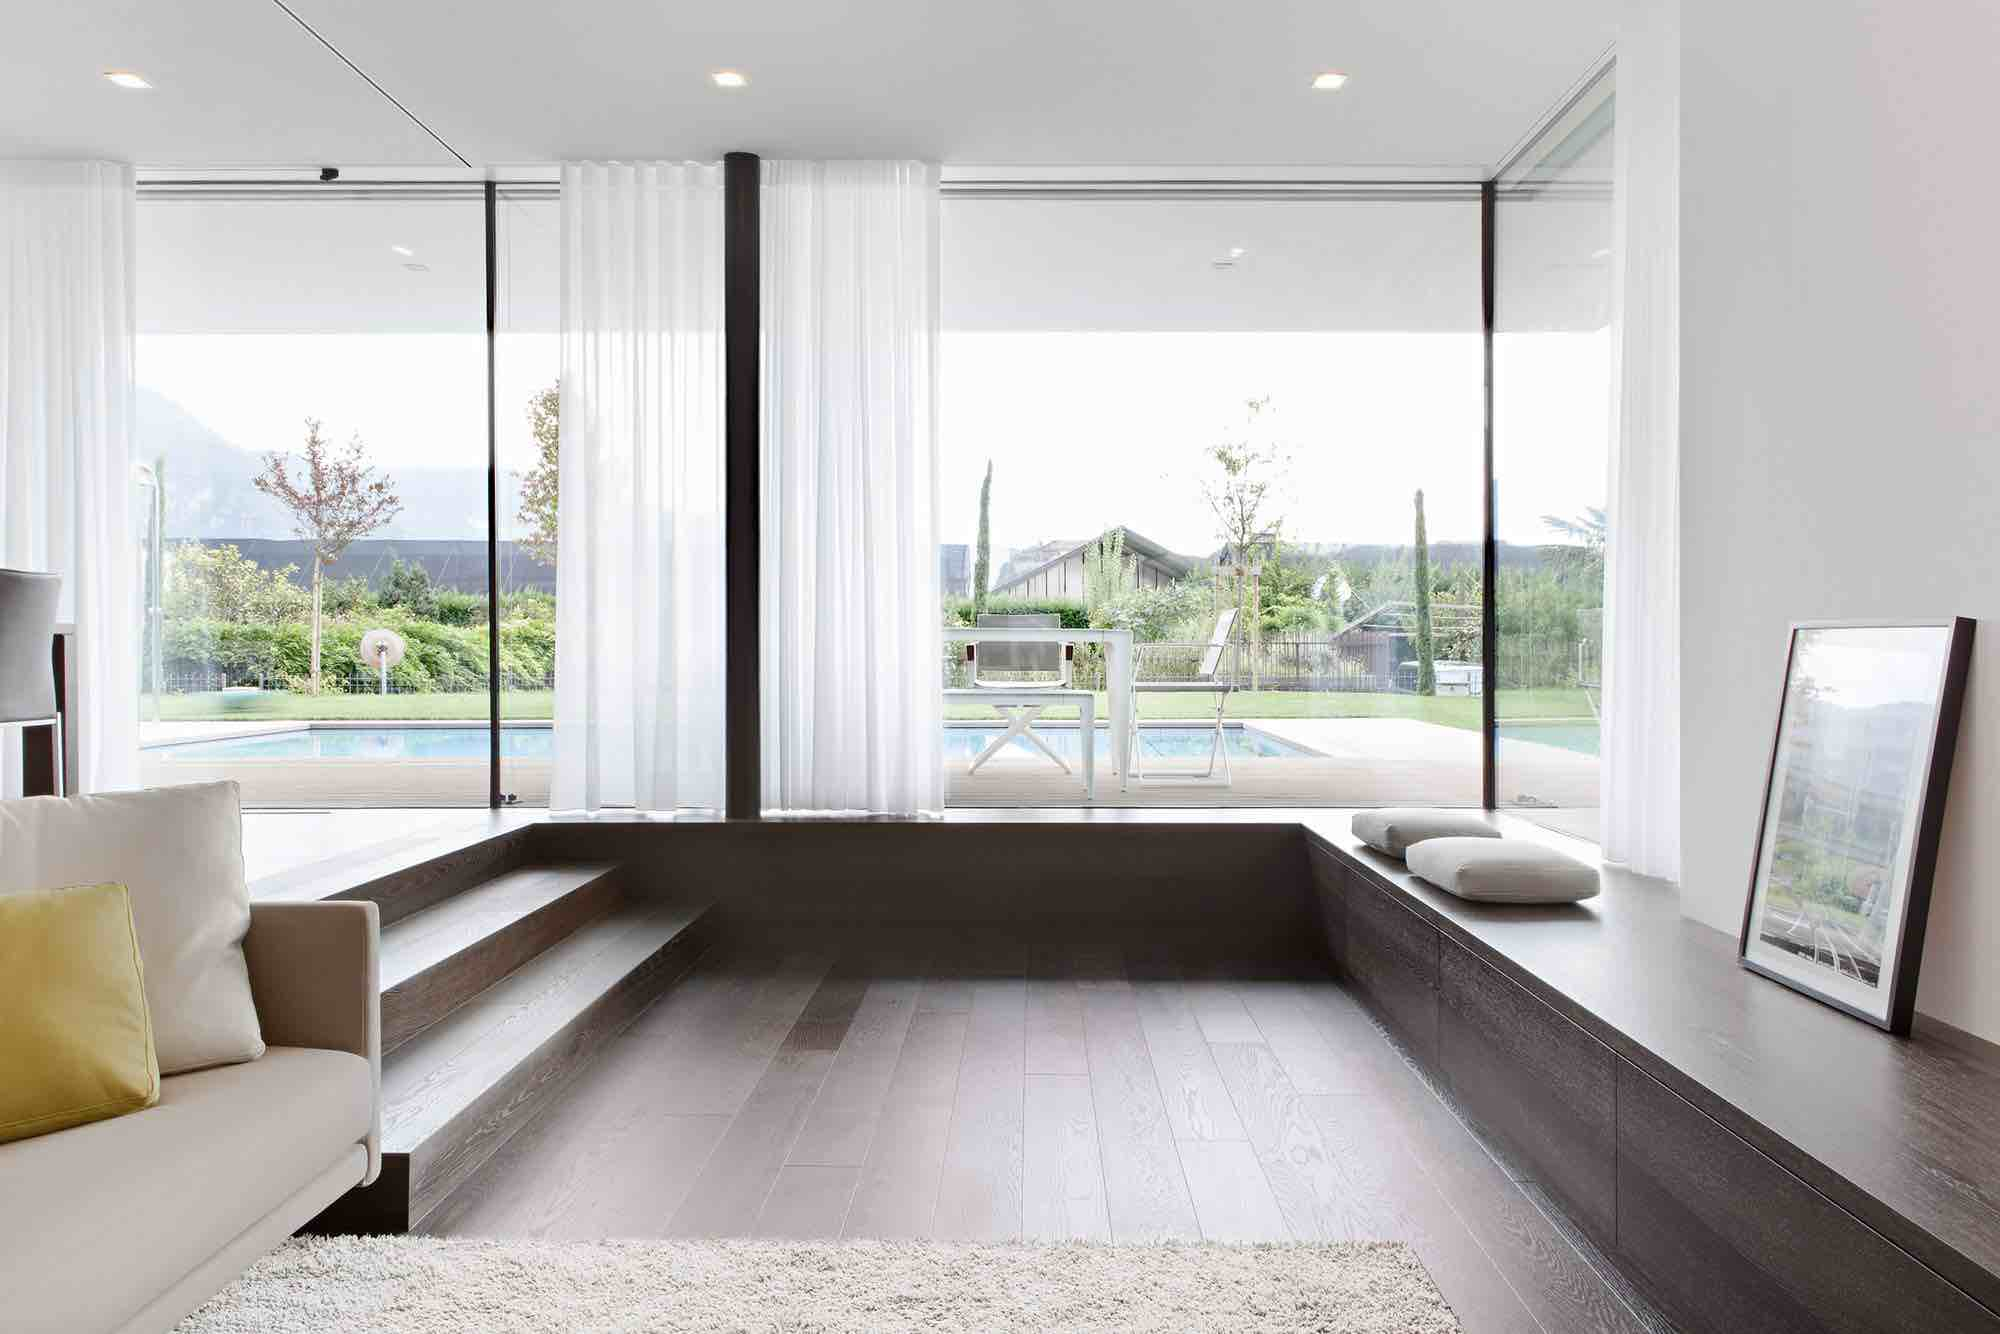 m2-house-monovolume-architecture-design_villa_moritzing_21